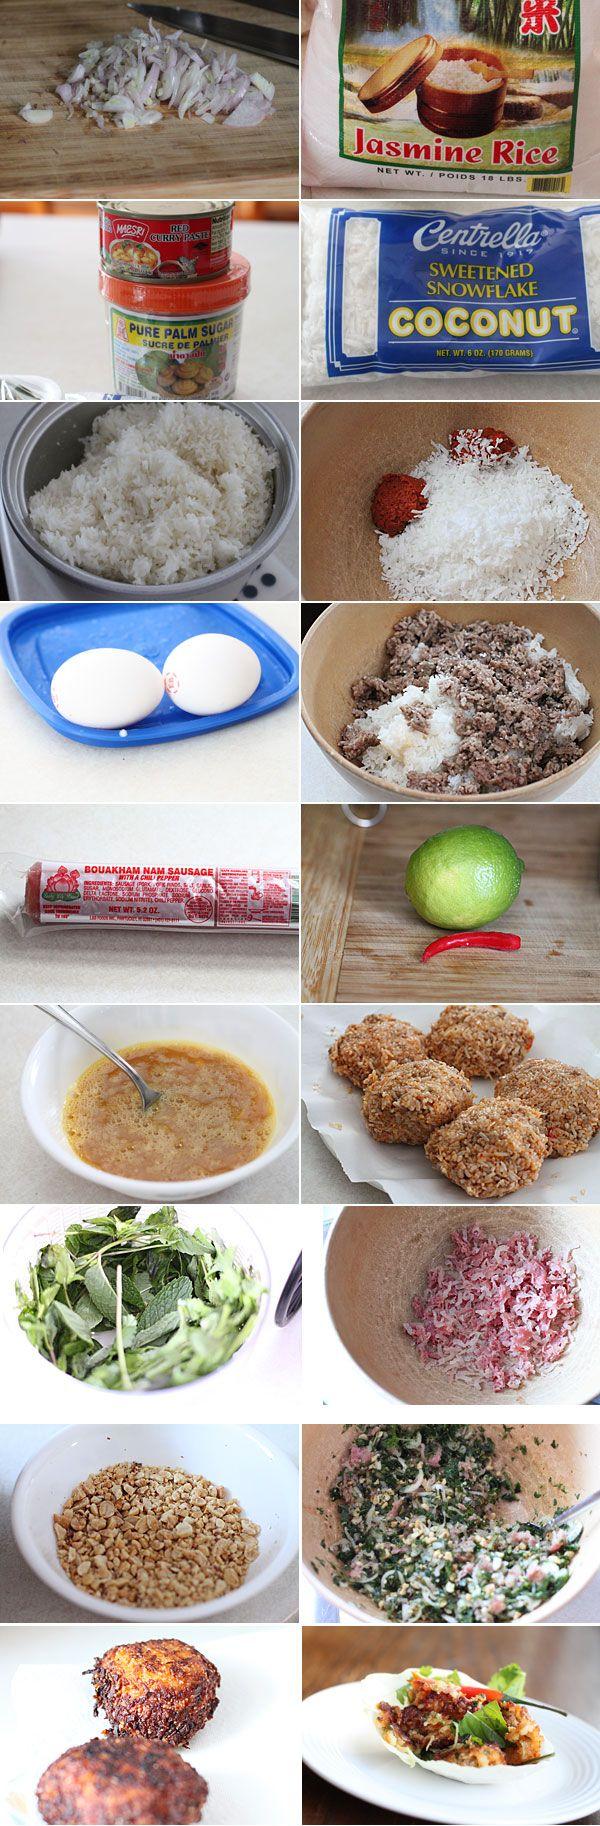 How to make nam khao